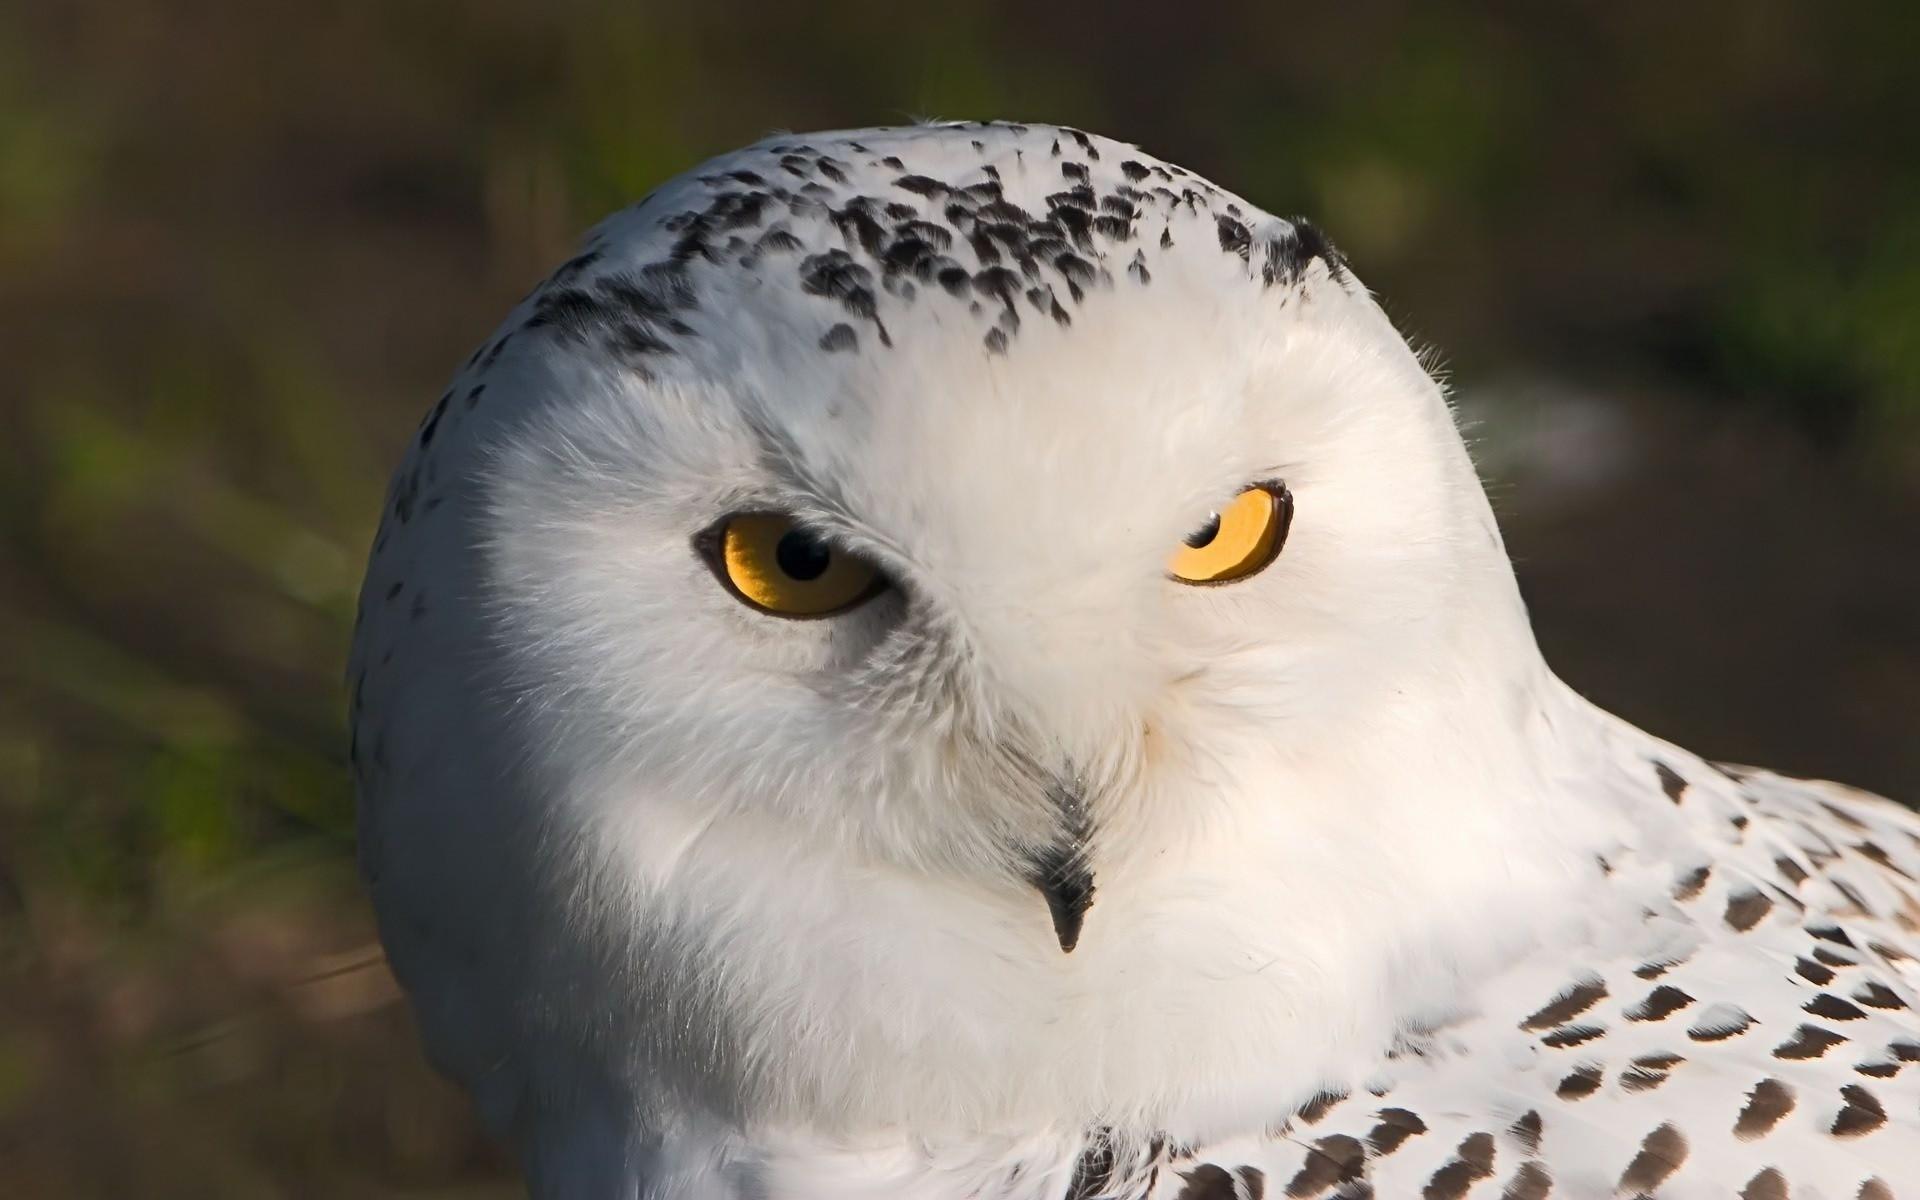 Res: 1920x1200, Bild: White Owl wallpapers and stock photos. Â«